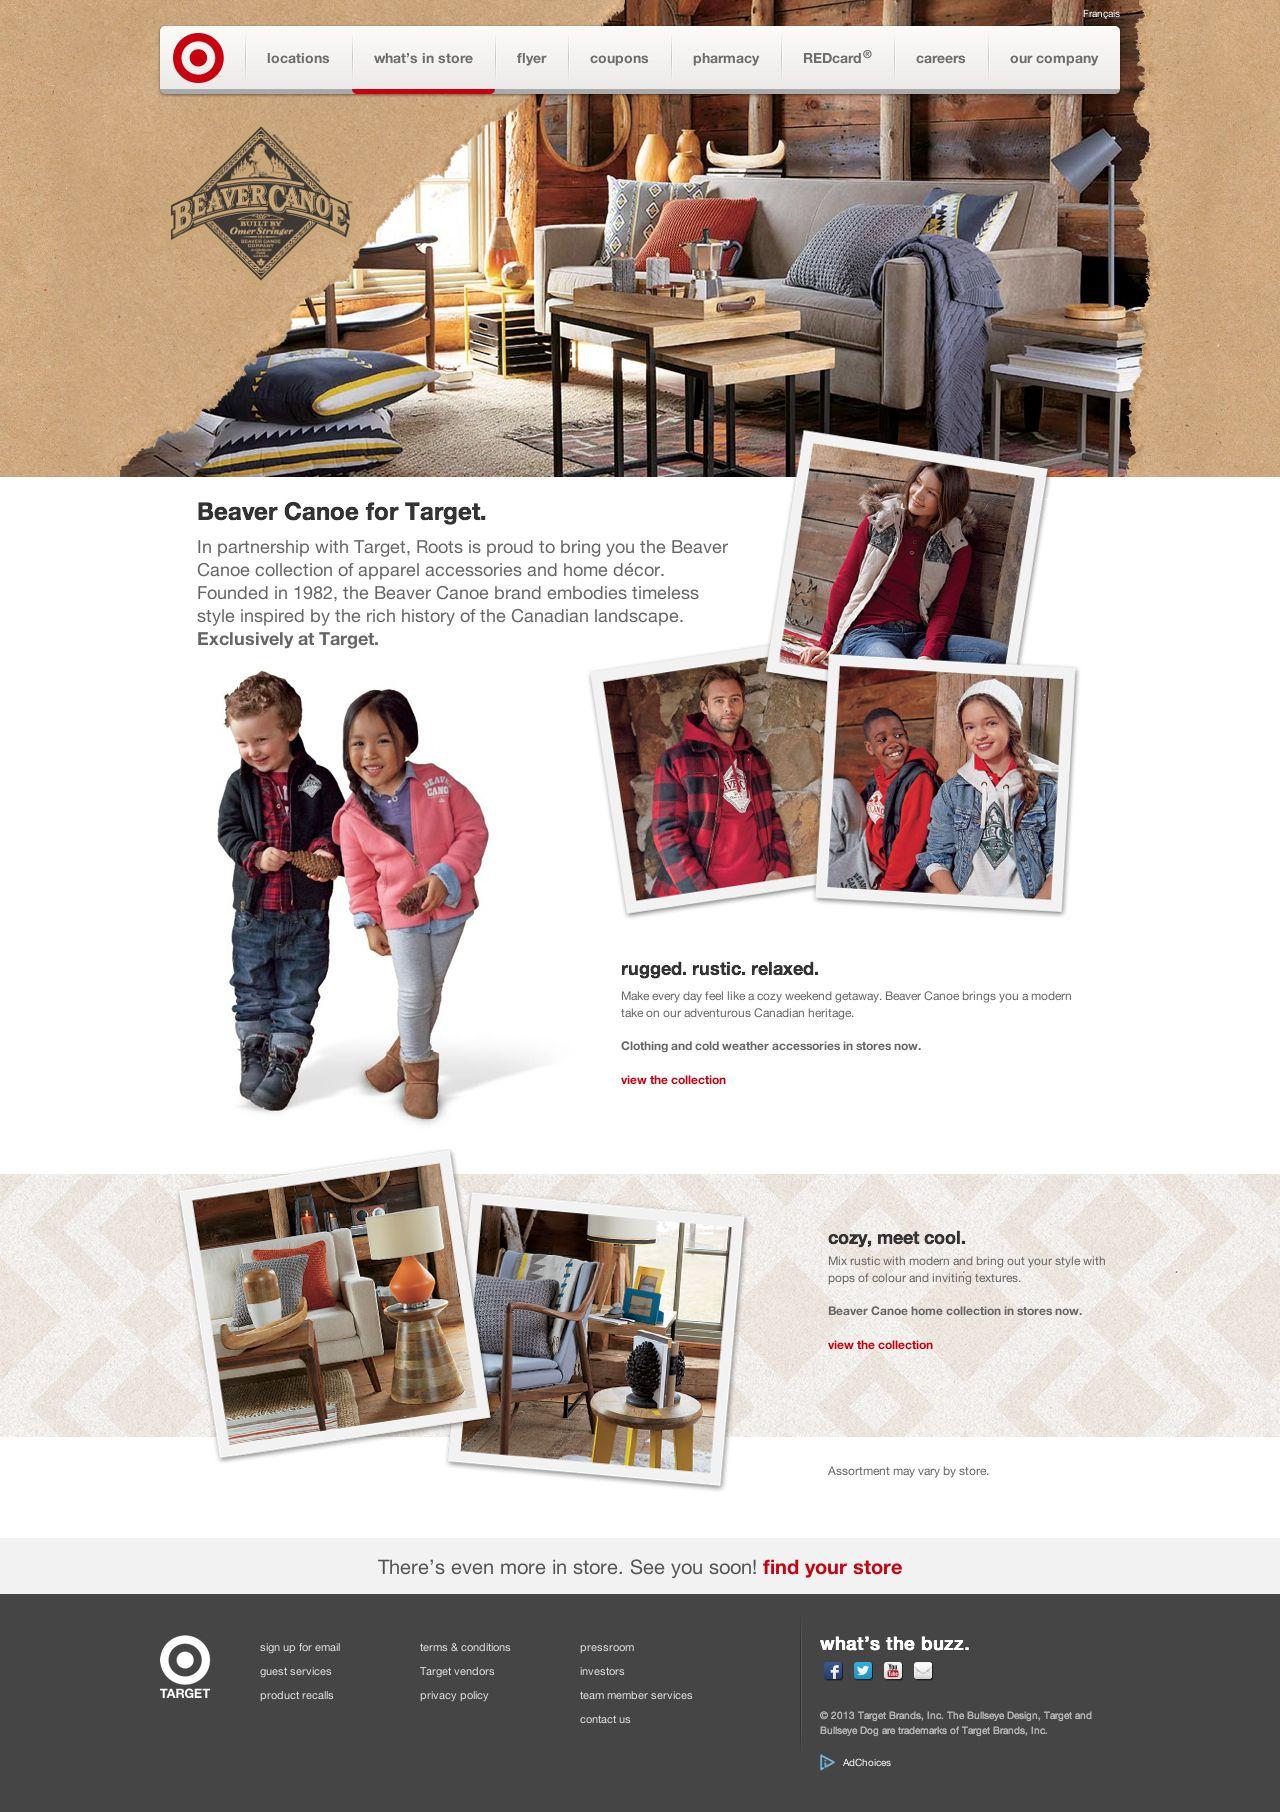 Beaver Canoe For Target Target Ca Canada Website Homepage Website Design Ecommerce Brand Web Development Design Fun Website Design Web Design